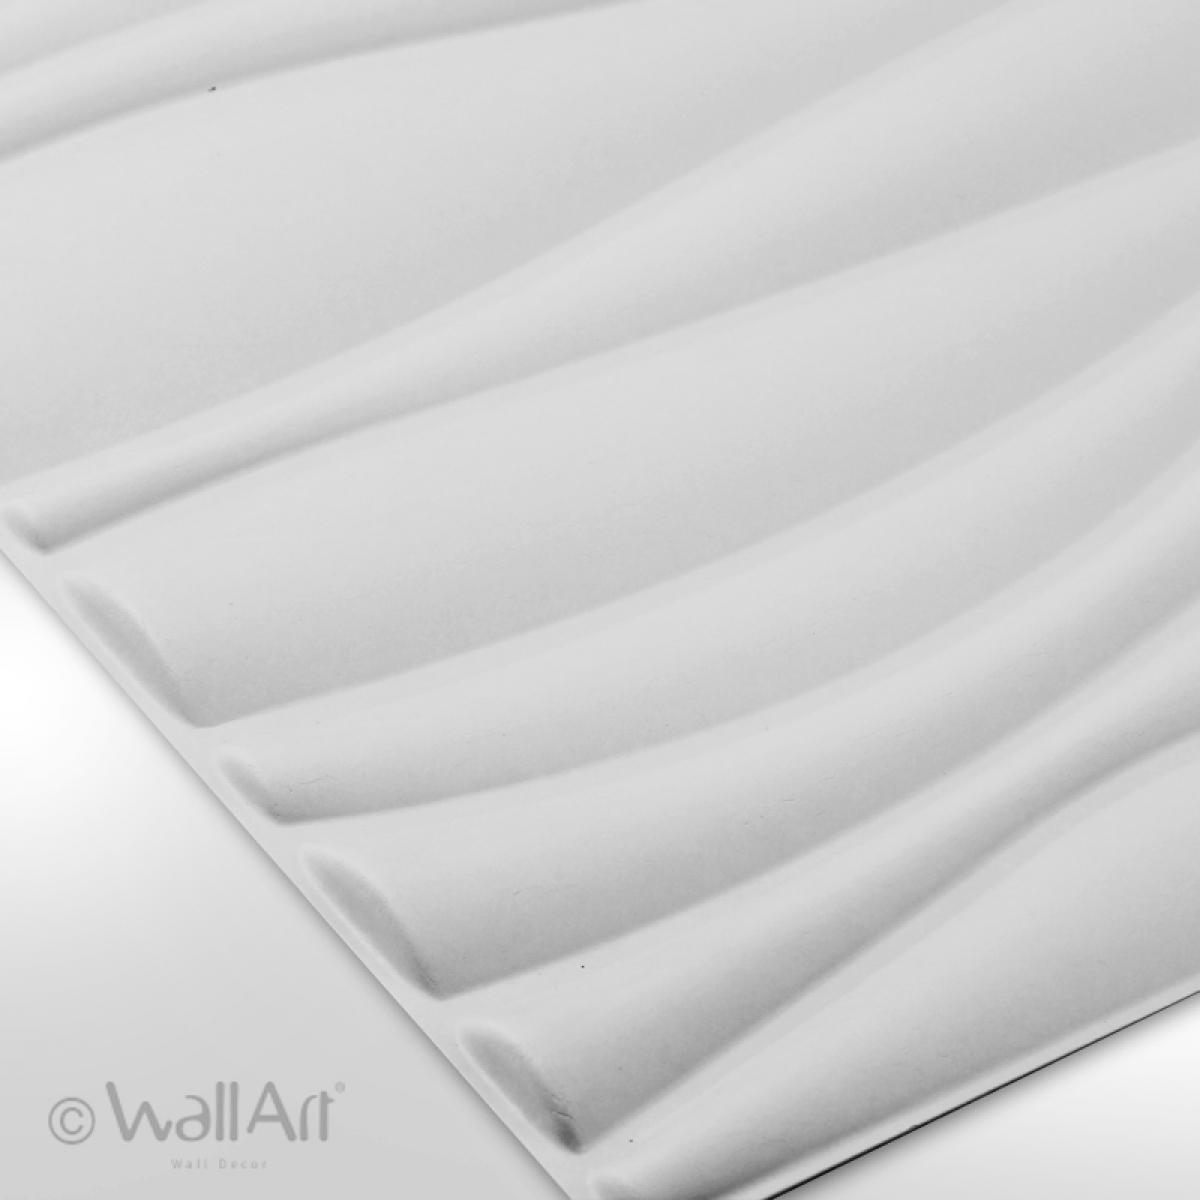 Panouri decorative 3D Waves WallArt, 12 placi 50x50cm